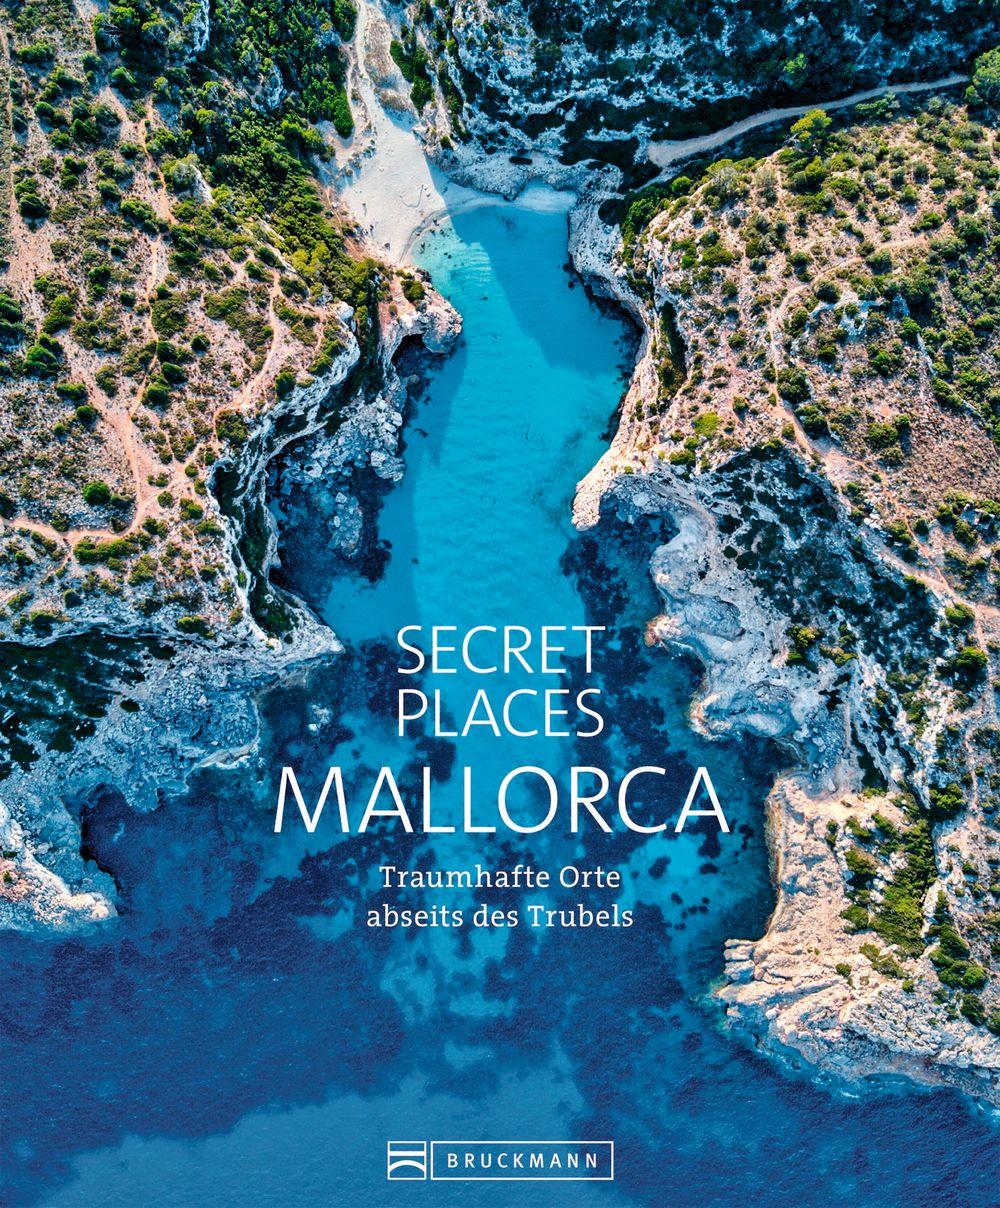 Secret Places Mallorca ISBN: 978-3-7343-1496-4  25,99 Euro